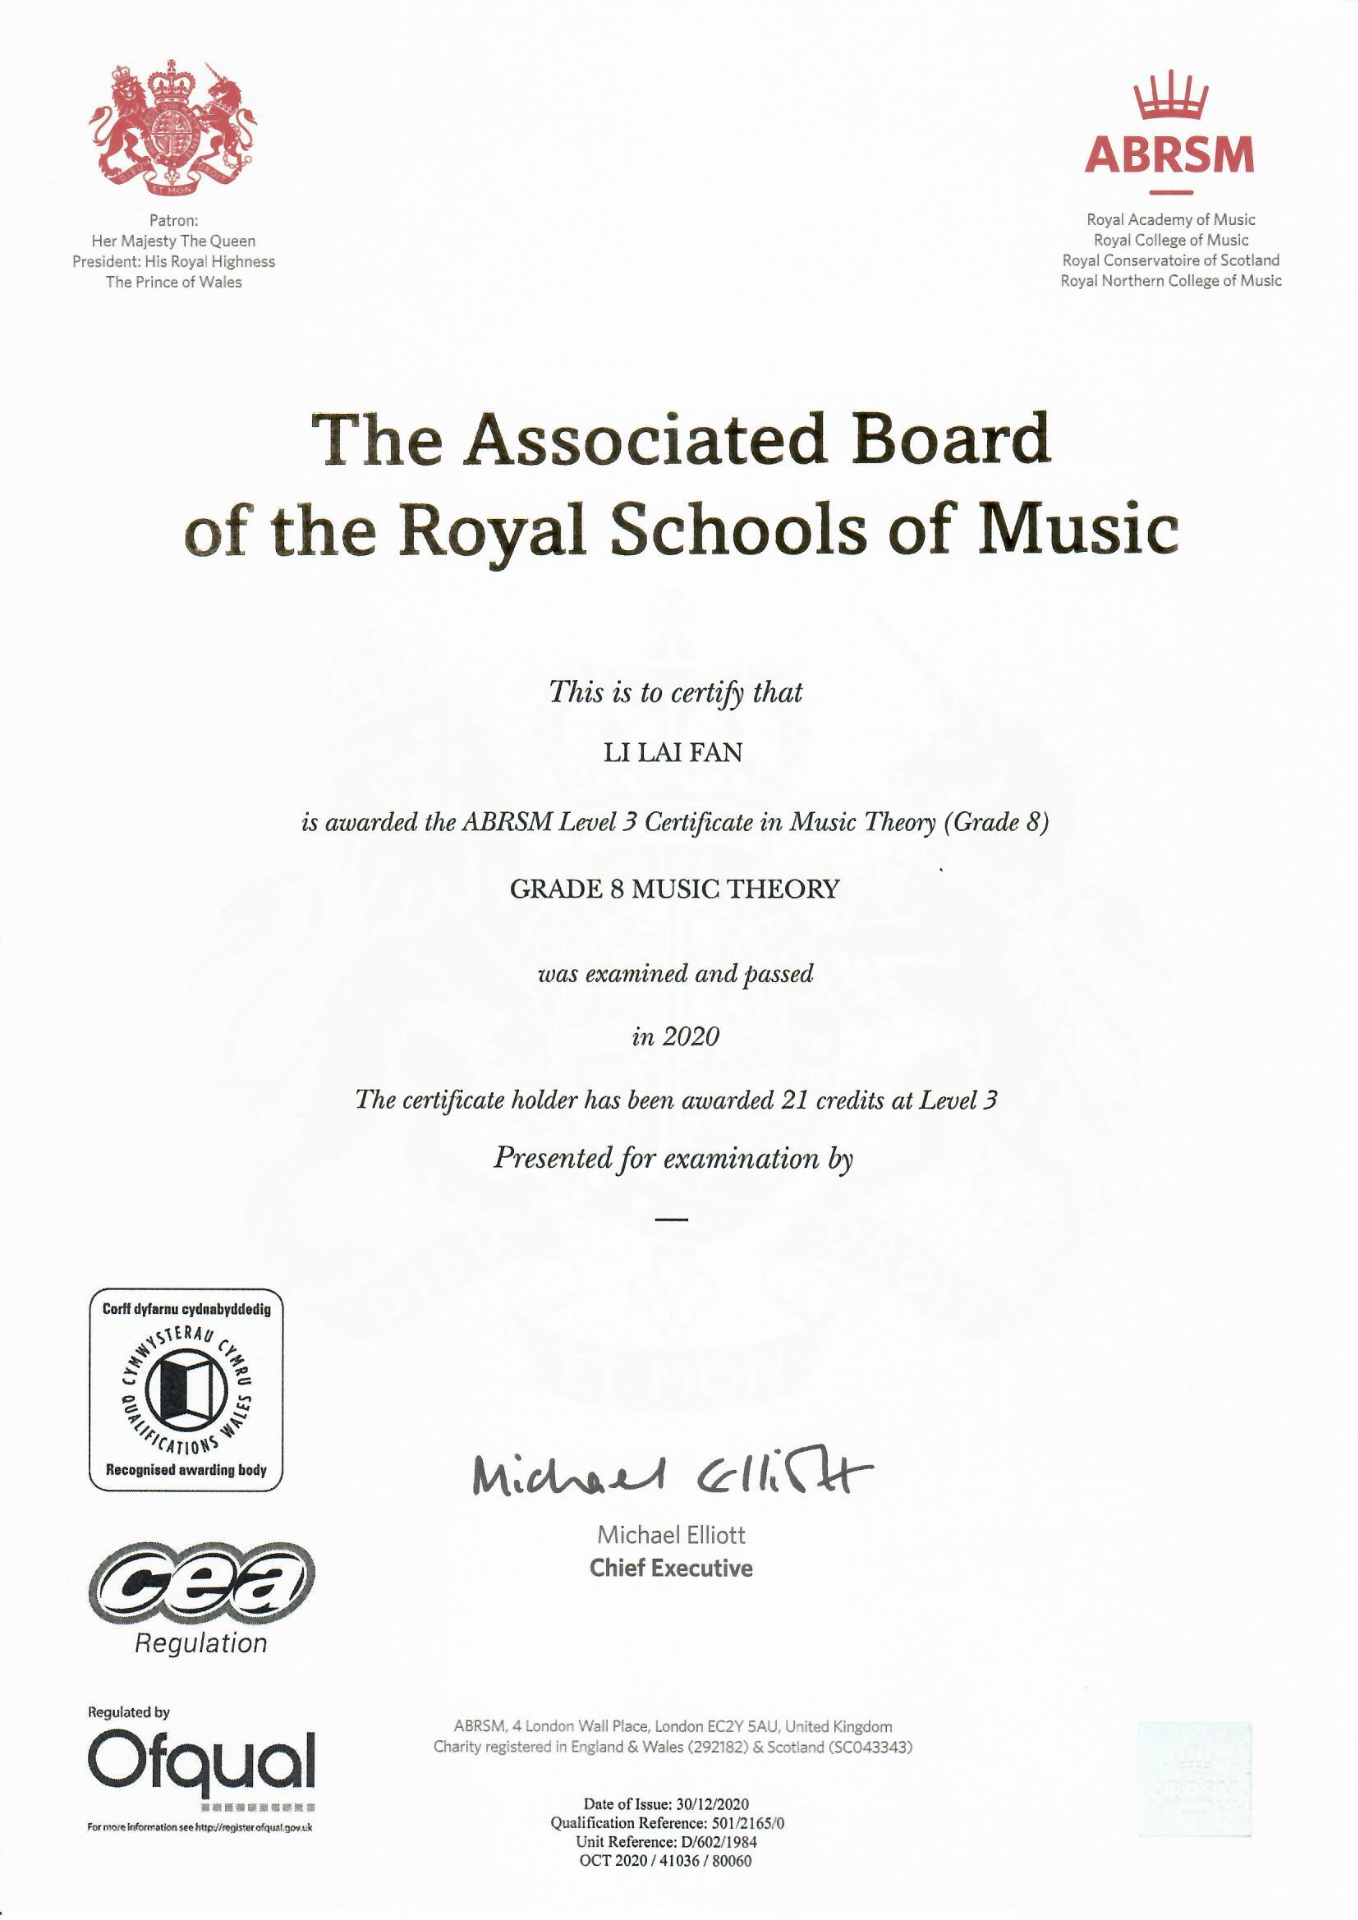 My ABRSM Music Theory Grade 8 cert.